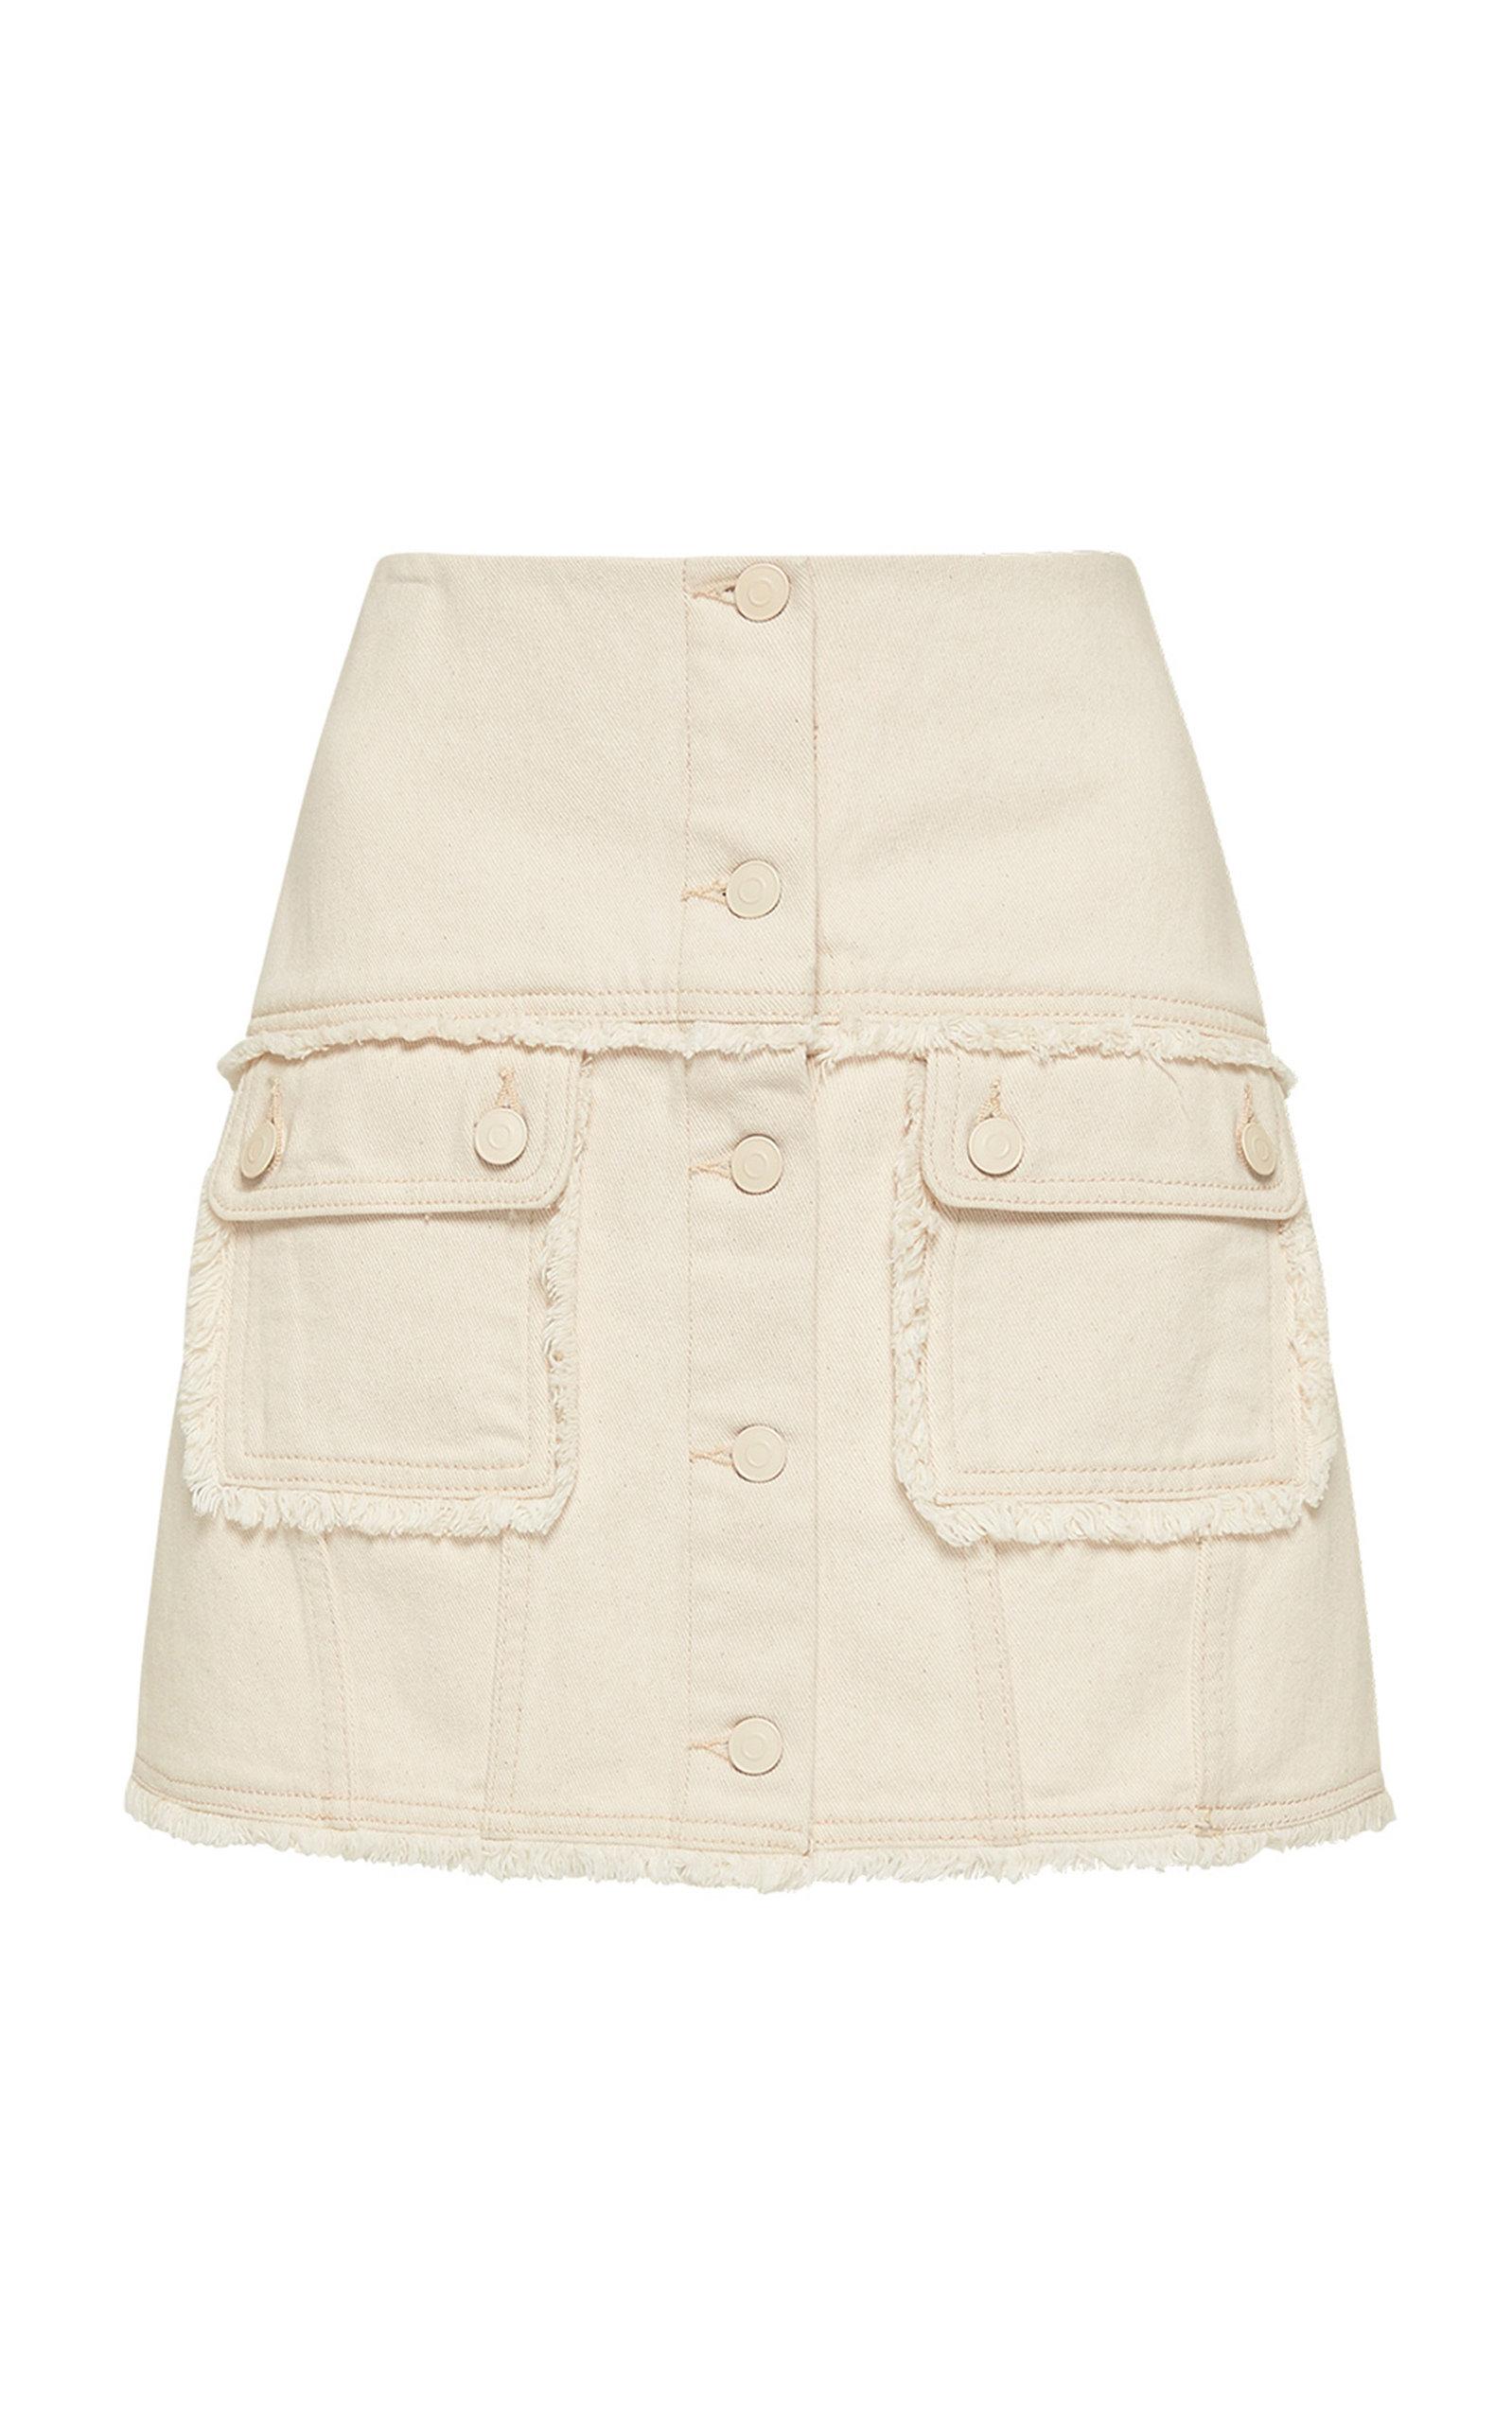 ALÉMAIS - Women's Yolo Denim Mini Skirt - Neutral - Moda Operandi